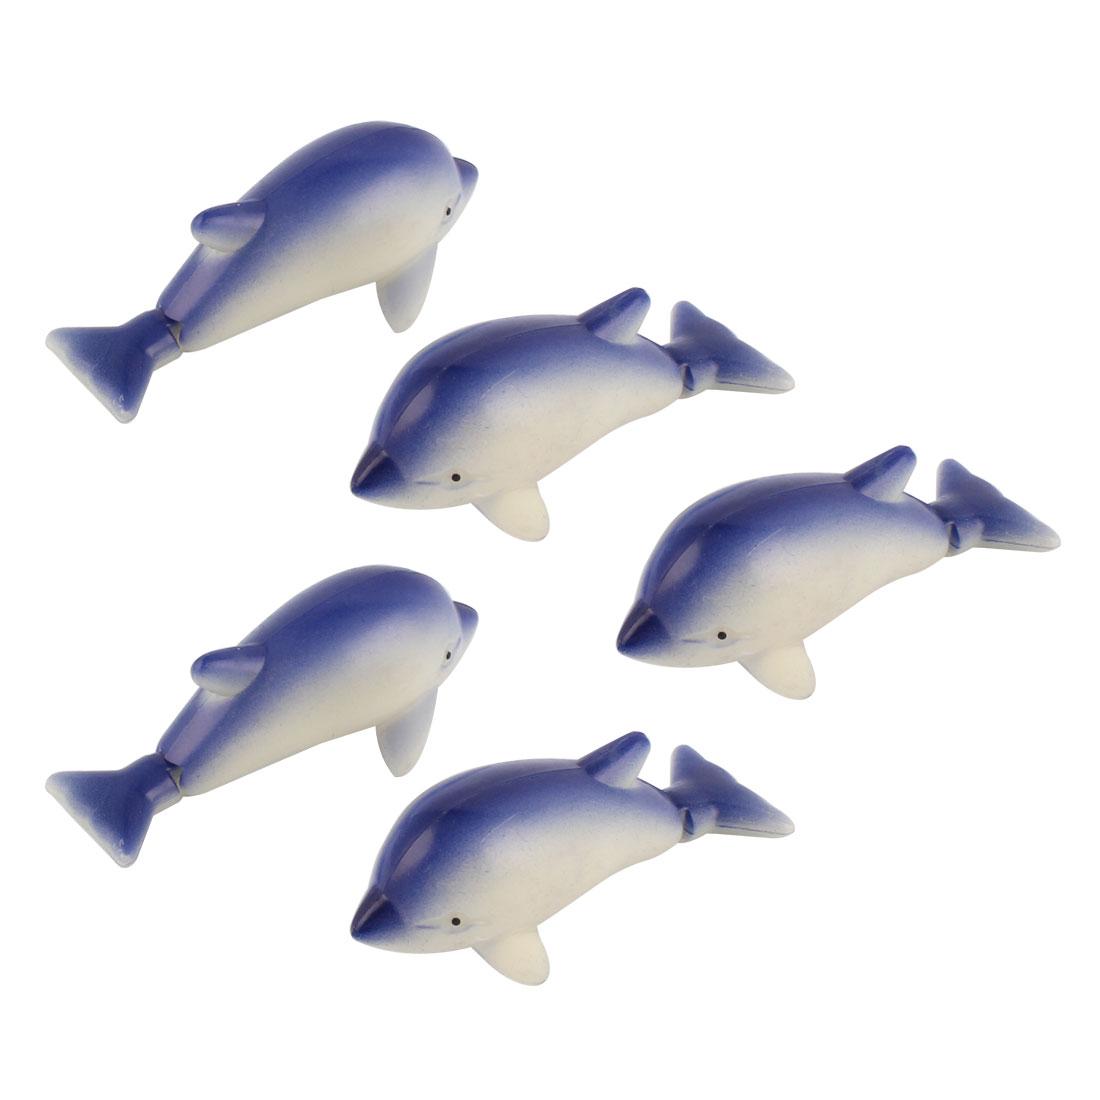 Plastic Artificial Aquarium Decoration Fish Tank Ornament Dolphin Blue Beige 5pcs